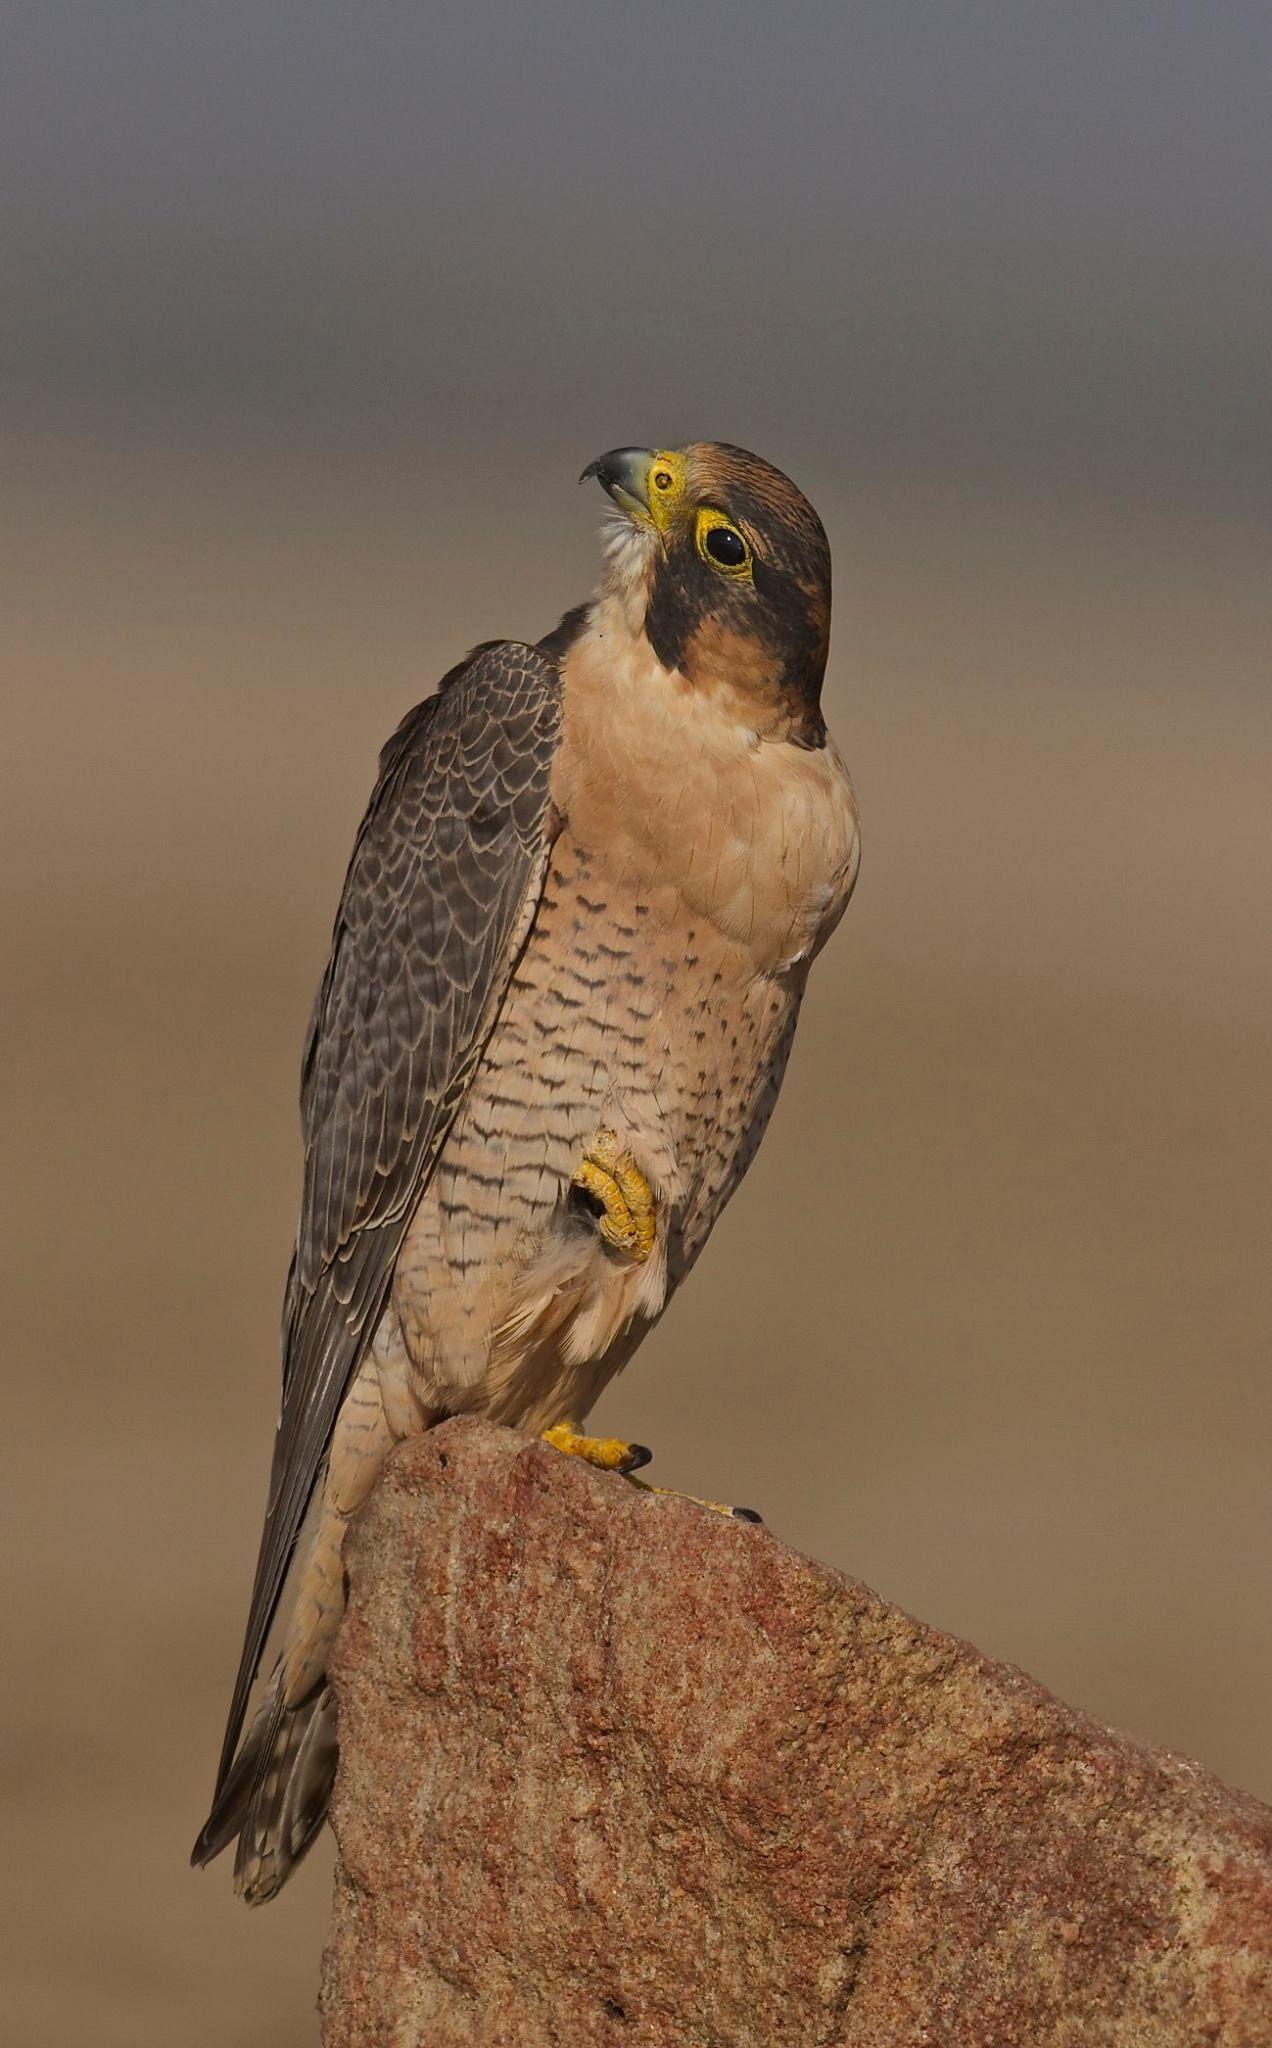 Red Naped Shaheen Falcon Peregrine Birds Of Prey Kestrel Raptors Falcons